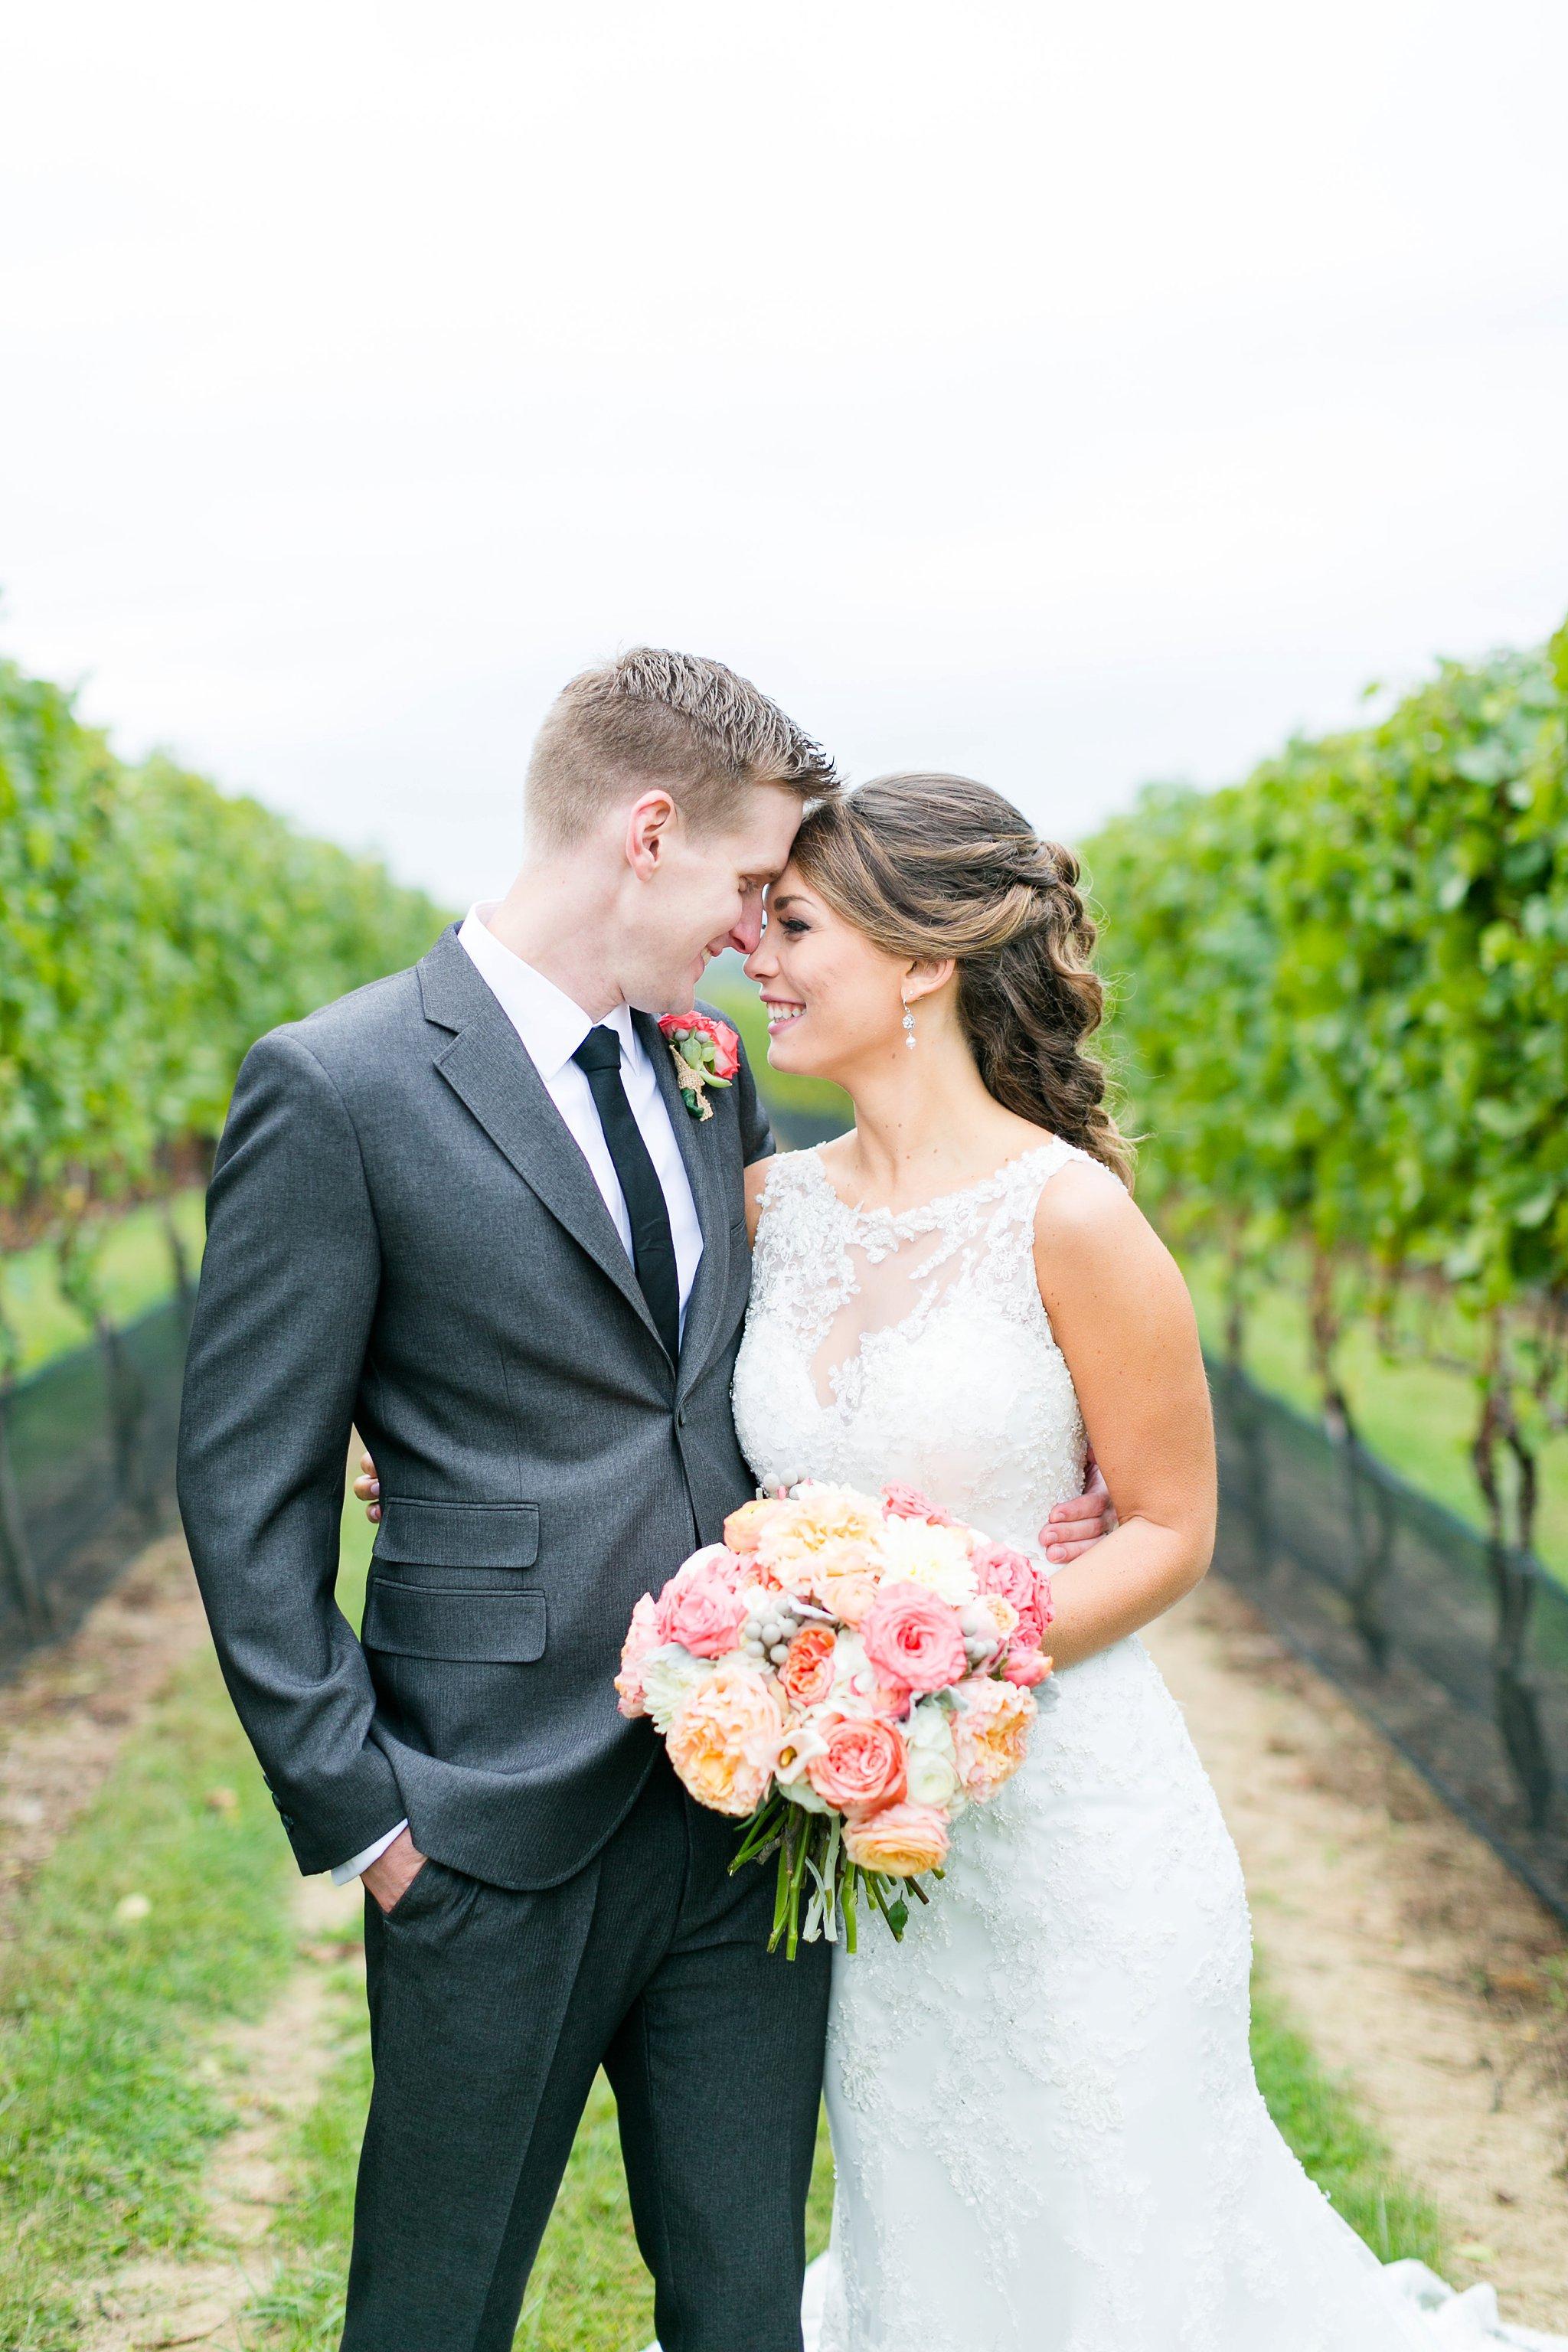 Stone Tower Winery Wedding Photos Virginia Wedding Photographer Megan Kelsey Photography Sam & Angela-210.jpg